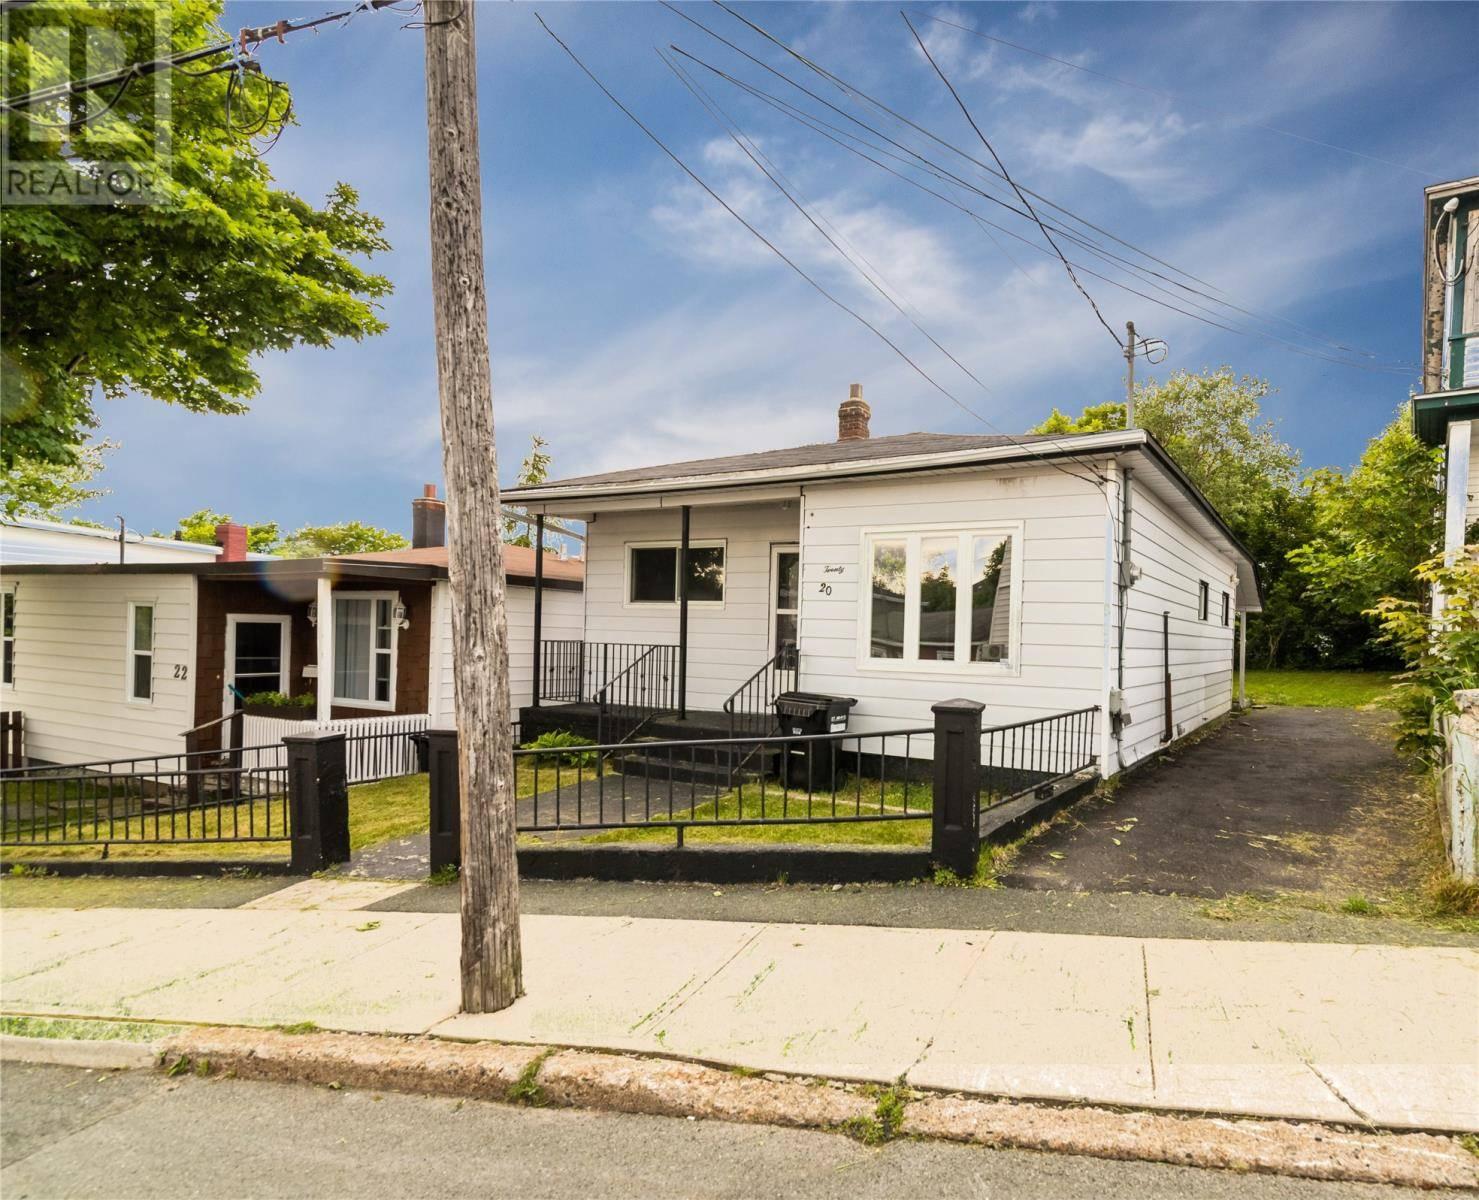 House for sale at 20 Rankin St St. John's Newfoundland - MLS: 1204831